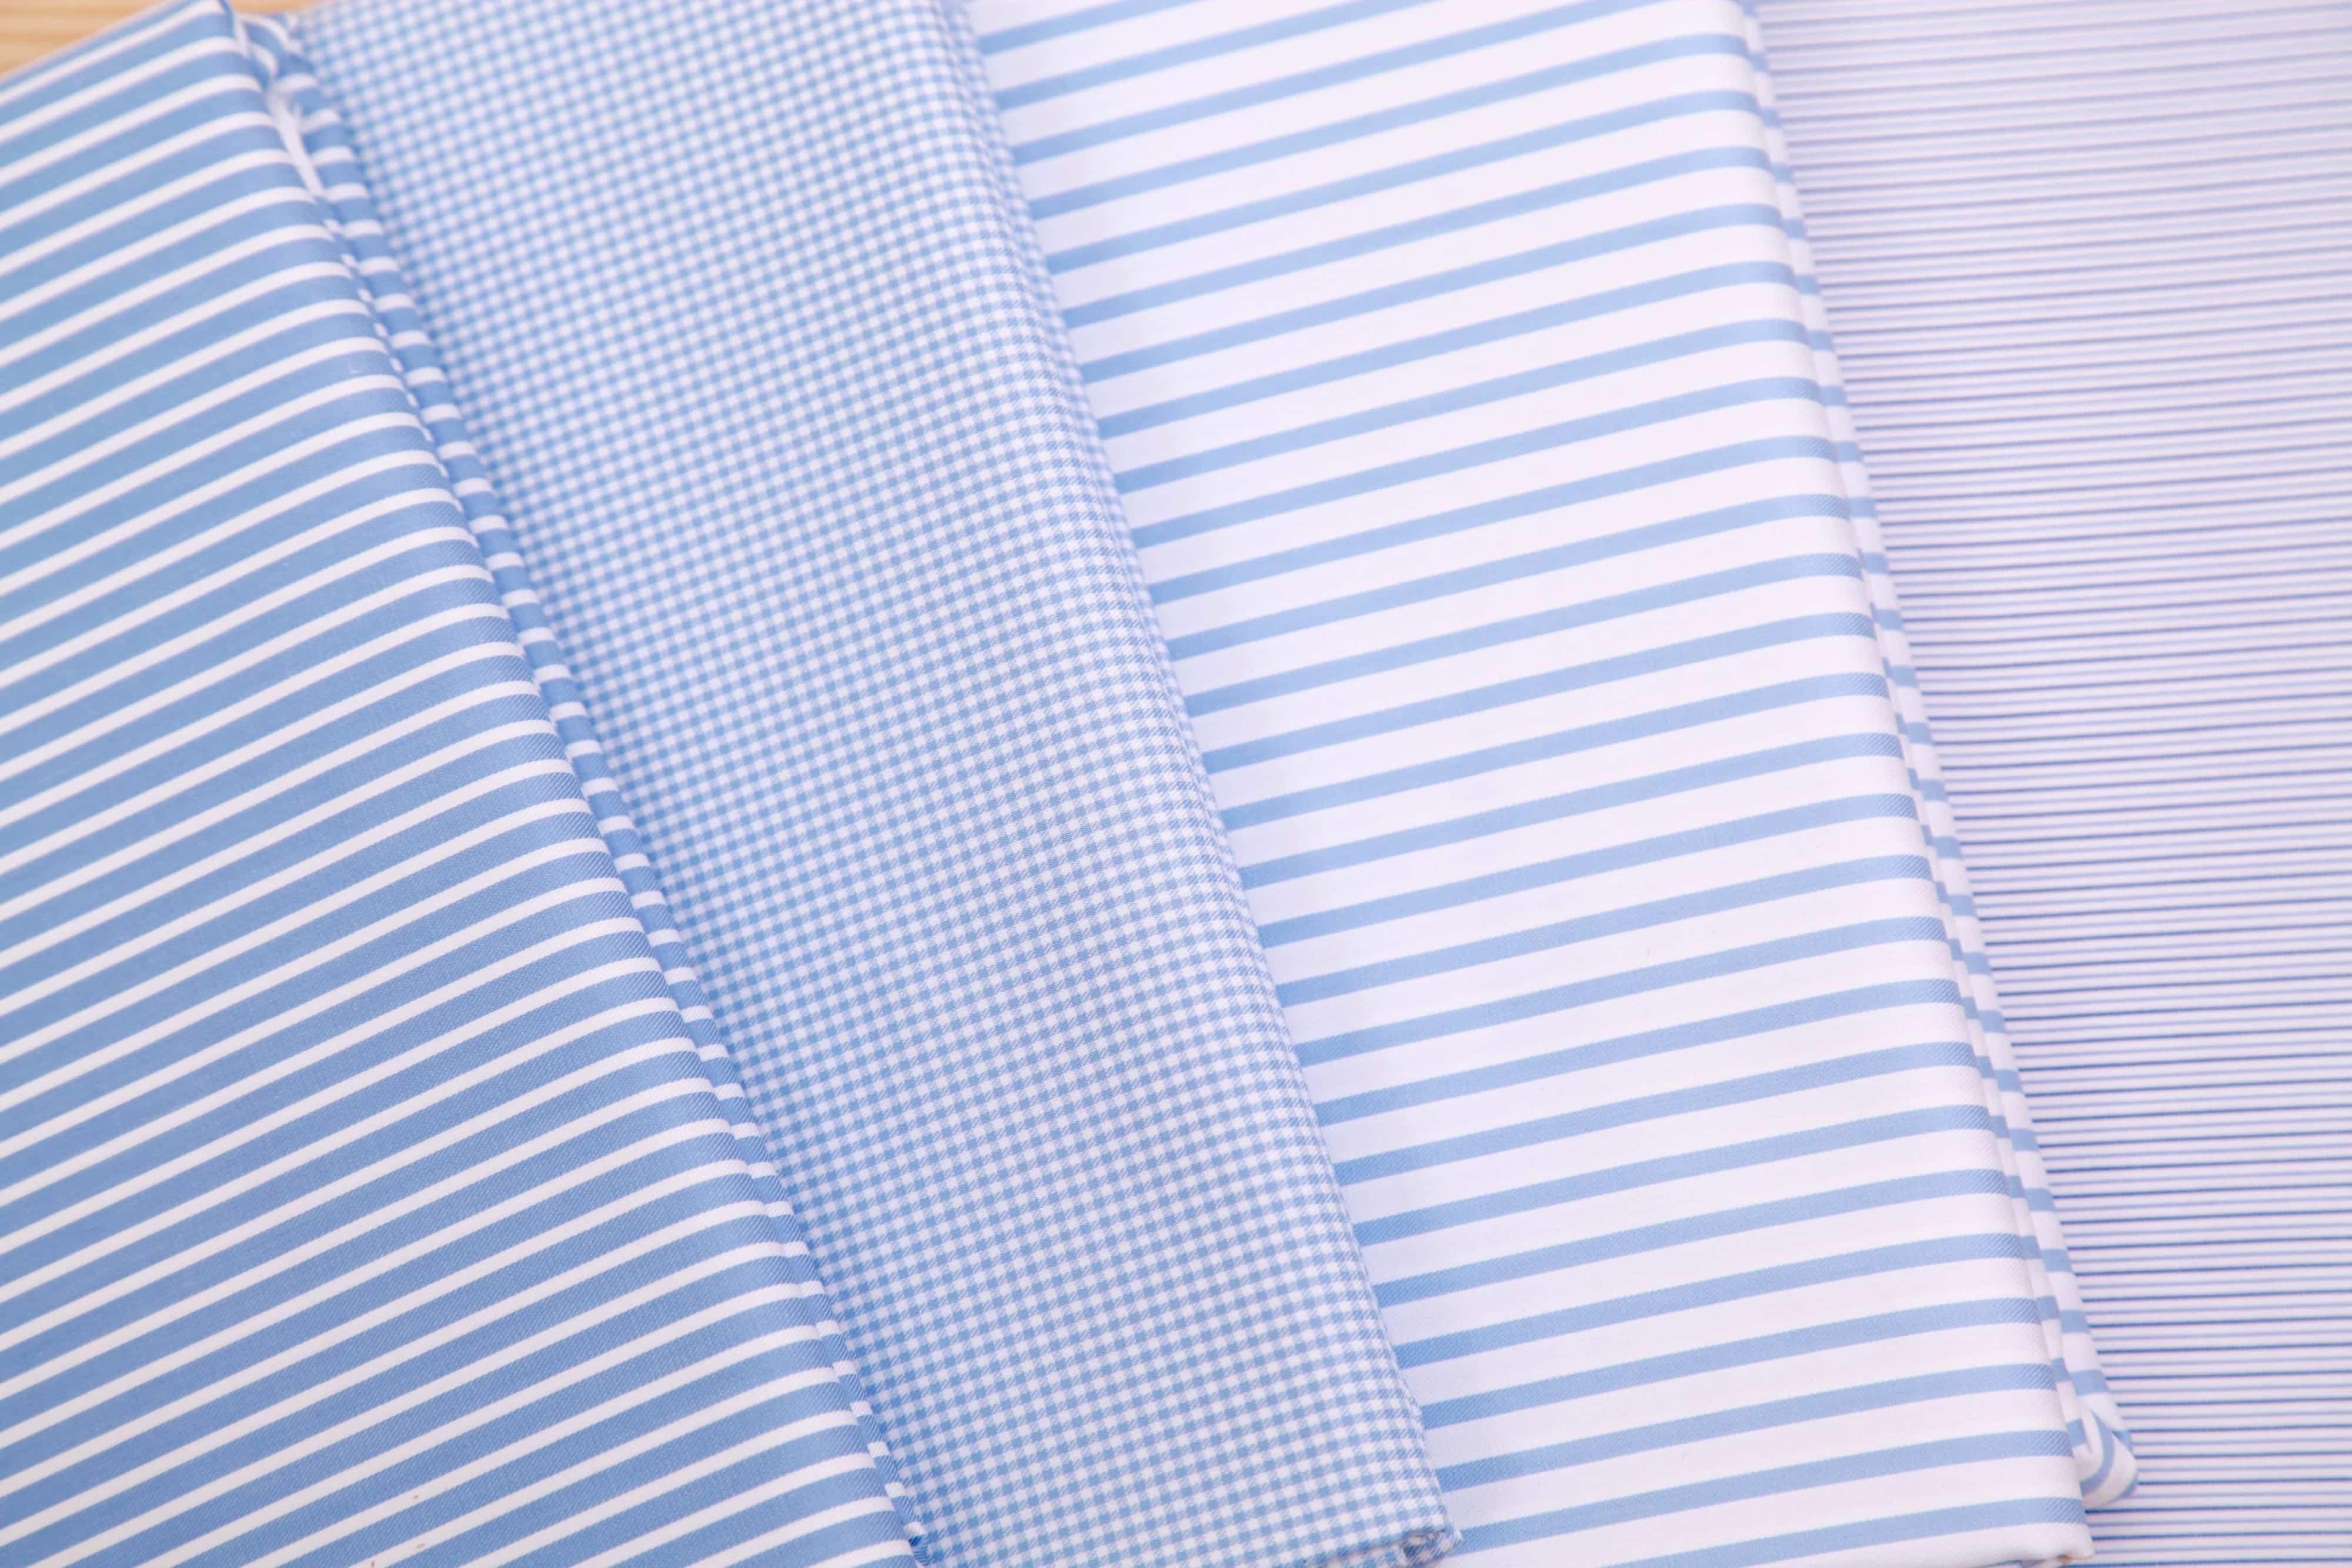 thomas mason, tissu, tissu chemise, coton égyptien, tissu égyptien, david and john andersen, tissu mason, tissu dja, chemise col officier, prix chemise sur mesure, chemises, chemise homme, comment choisir une chemise sur mesure, chemise sur mesure, chemise homme, chemise luxe